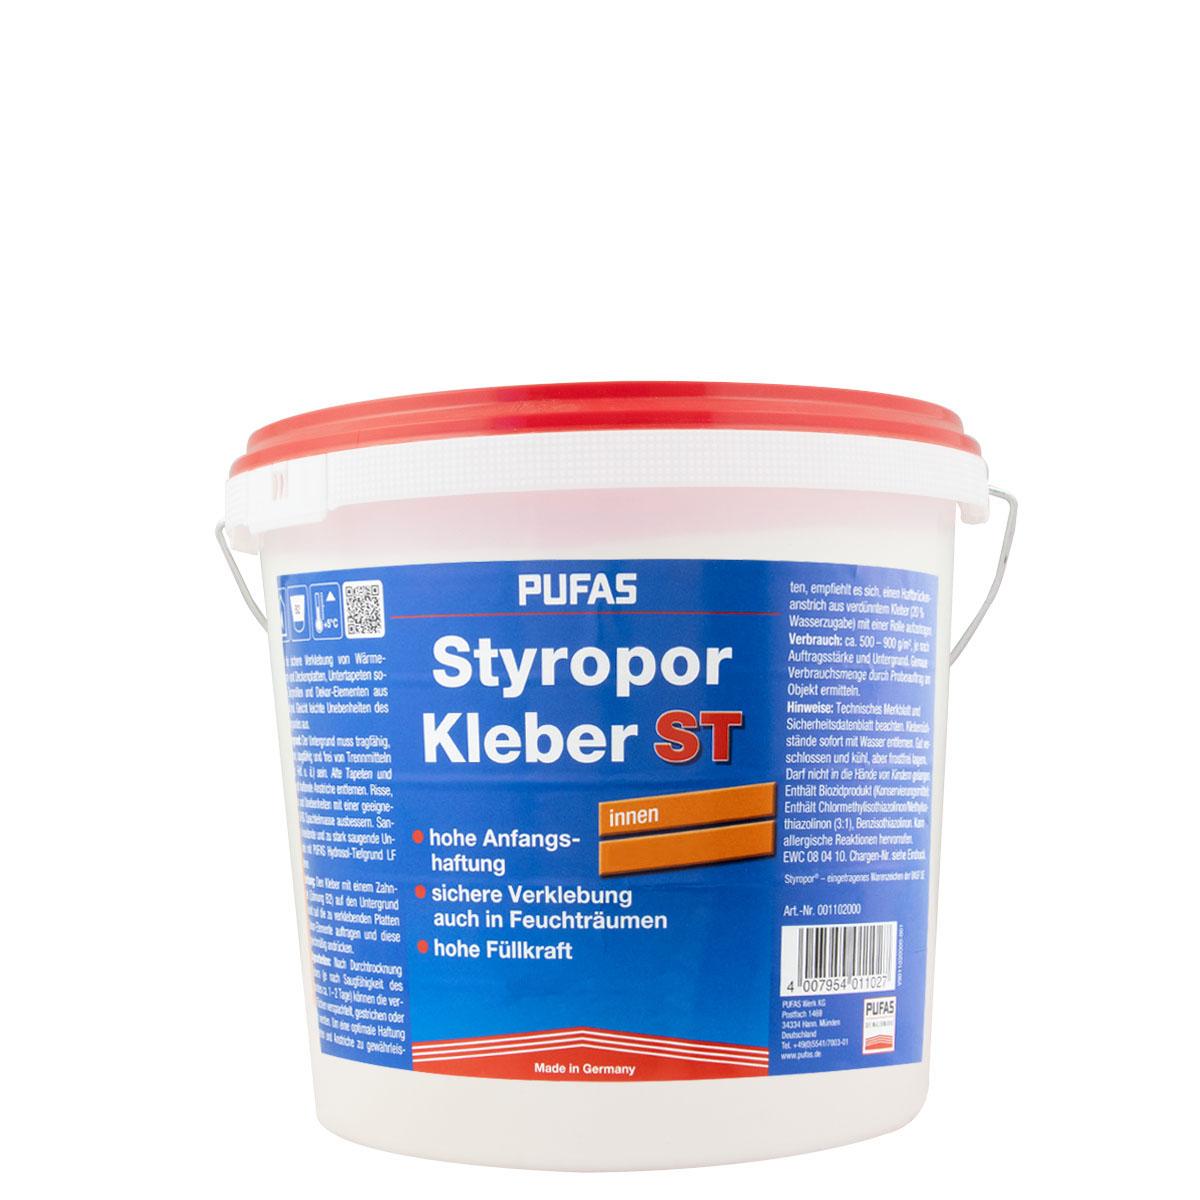 Pufas Styroporkleber 8Kg, Gebrauchsfertiger Dispersionsklebstoff